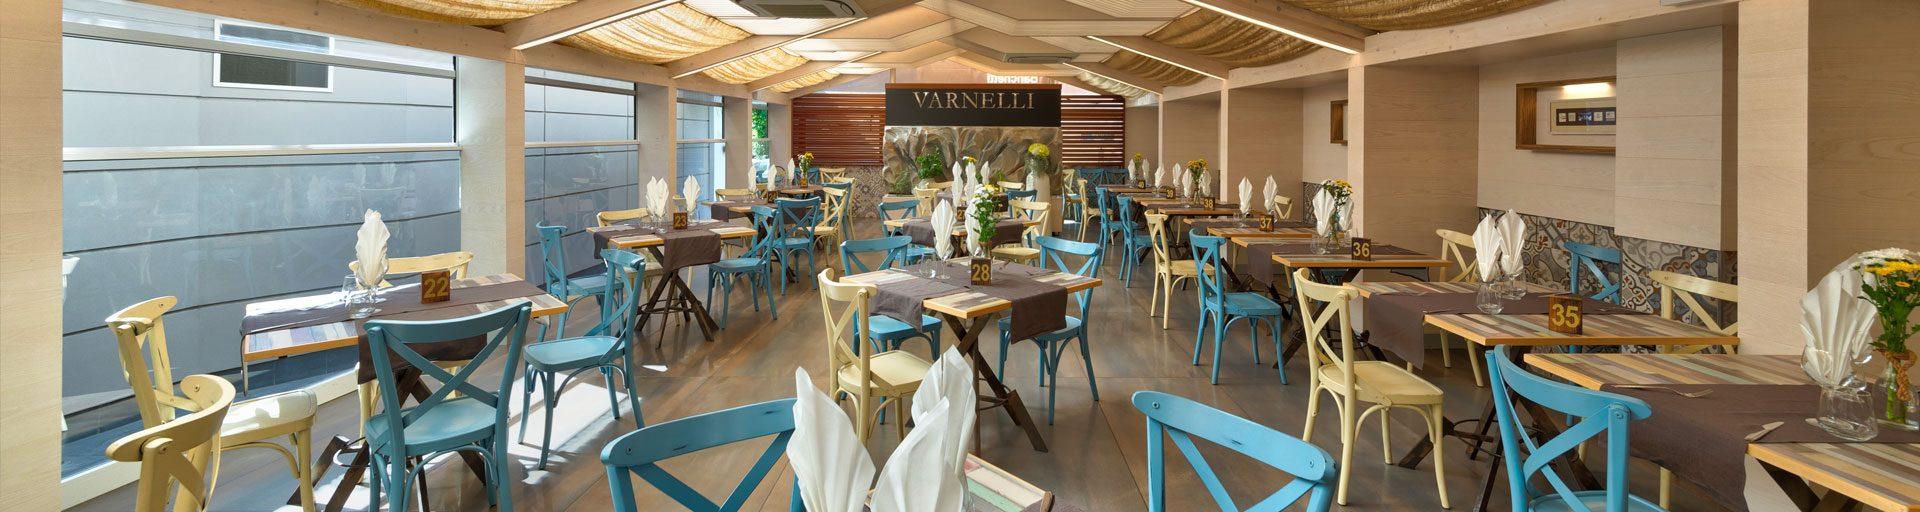 Ristorante Varnelli